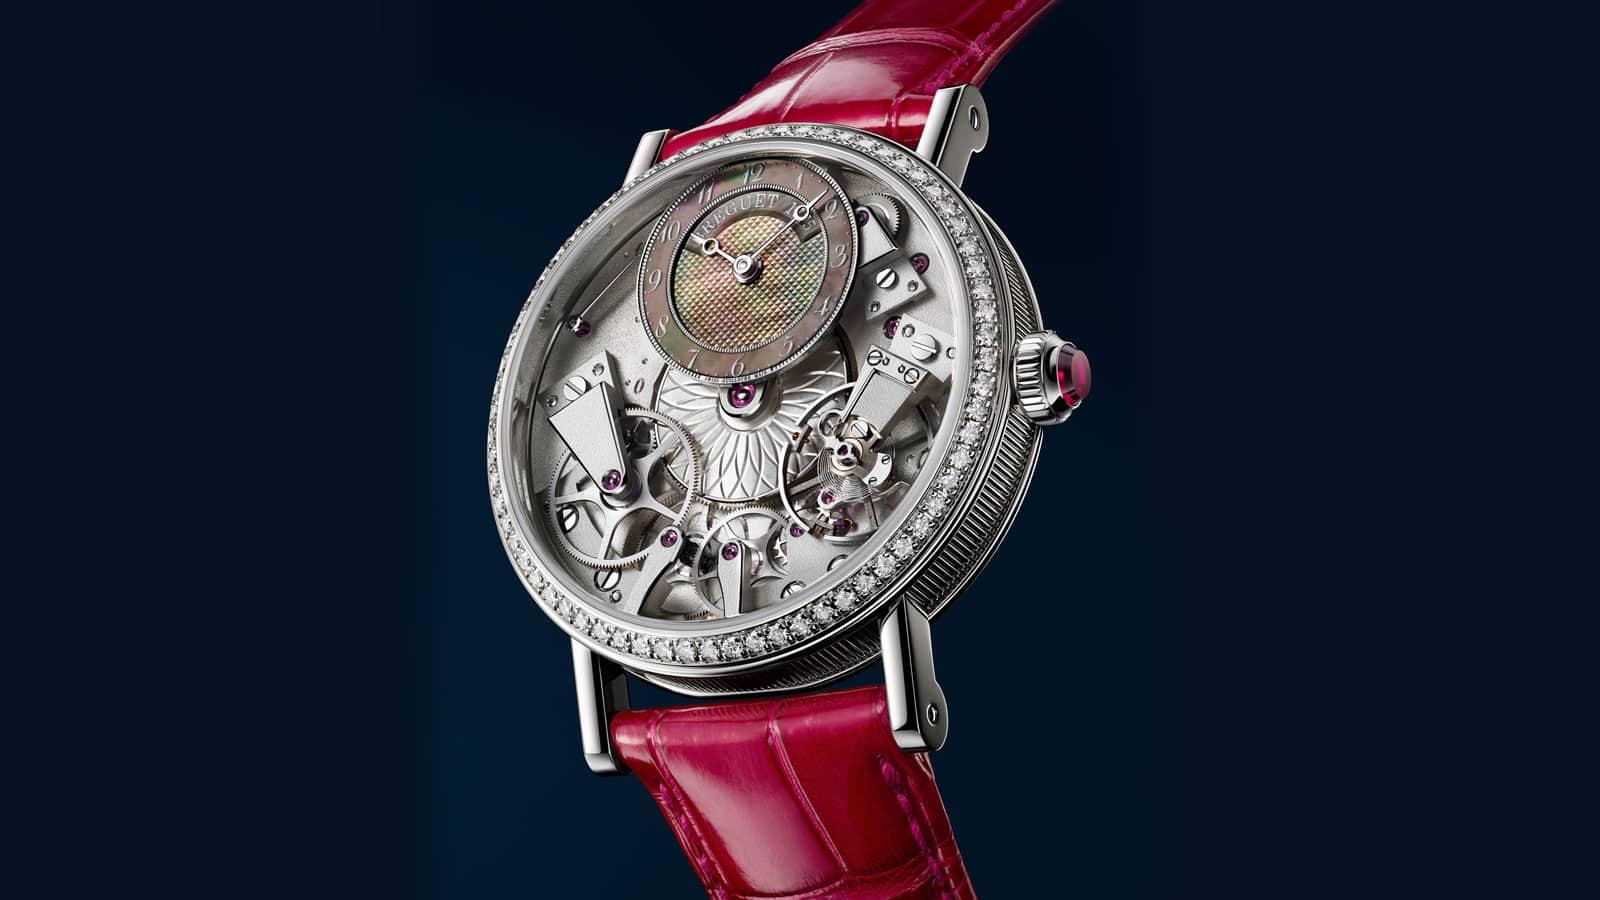 Breguet-7038BB_1T_9V6_Lionel-Meylan-horlogerie-joaillerie-vevey